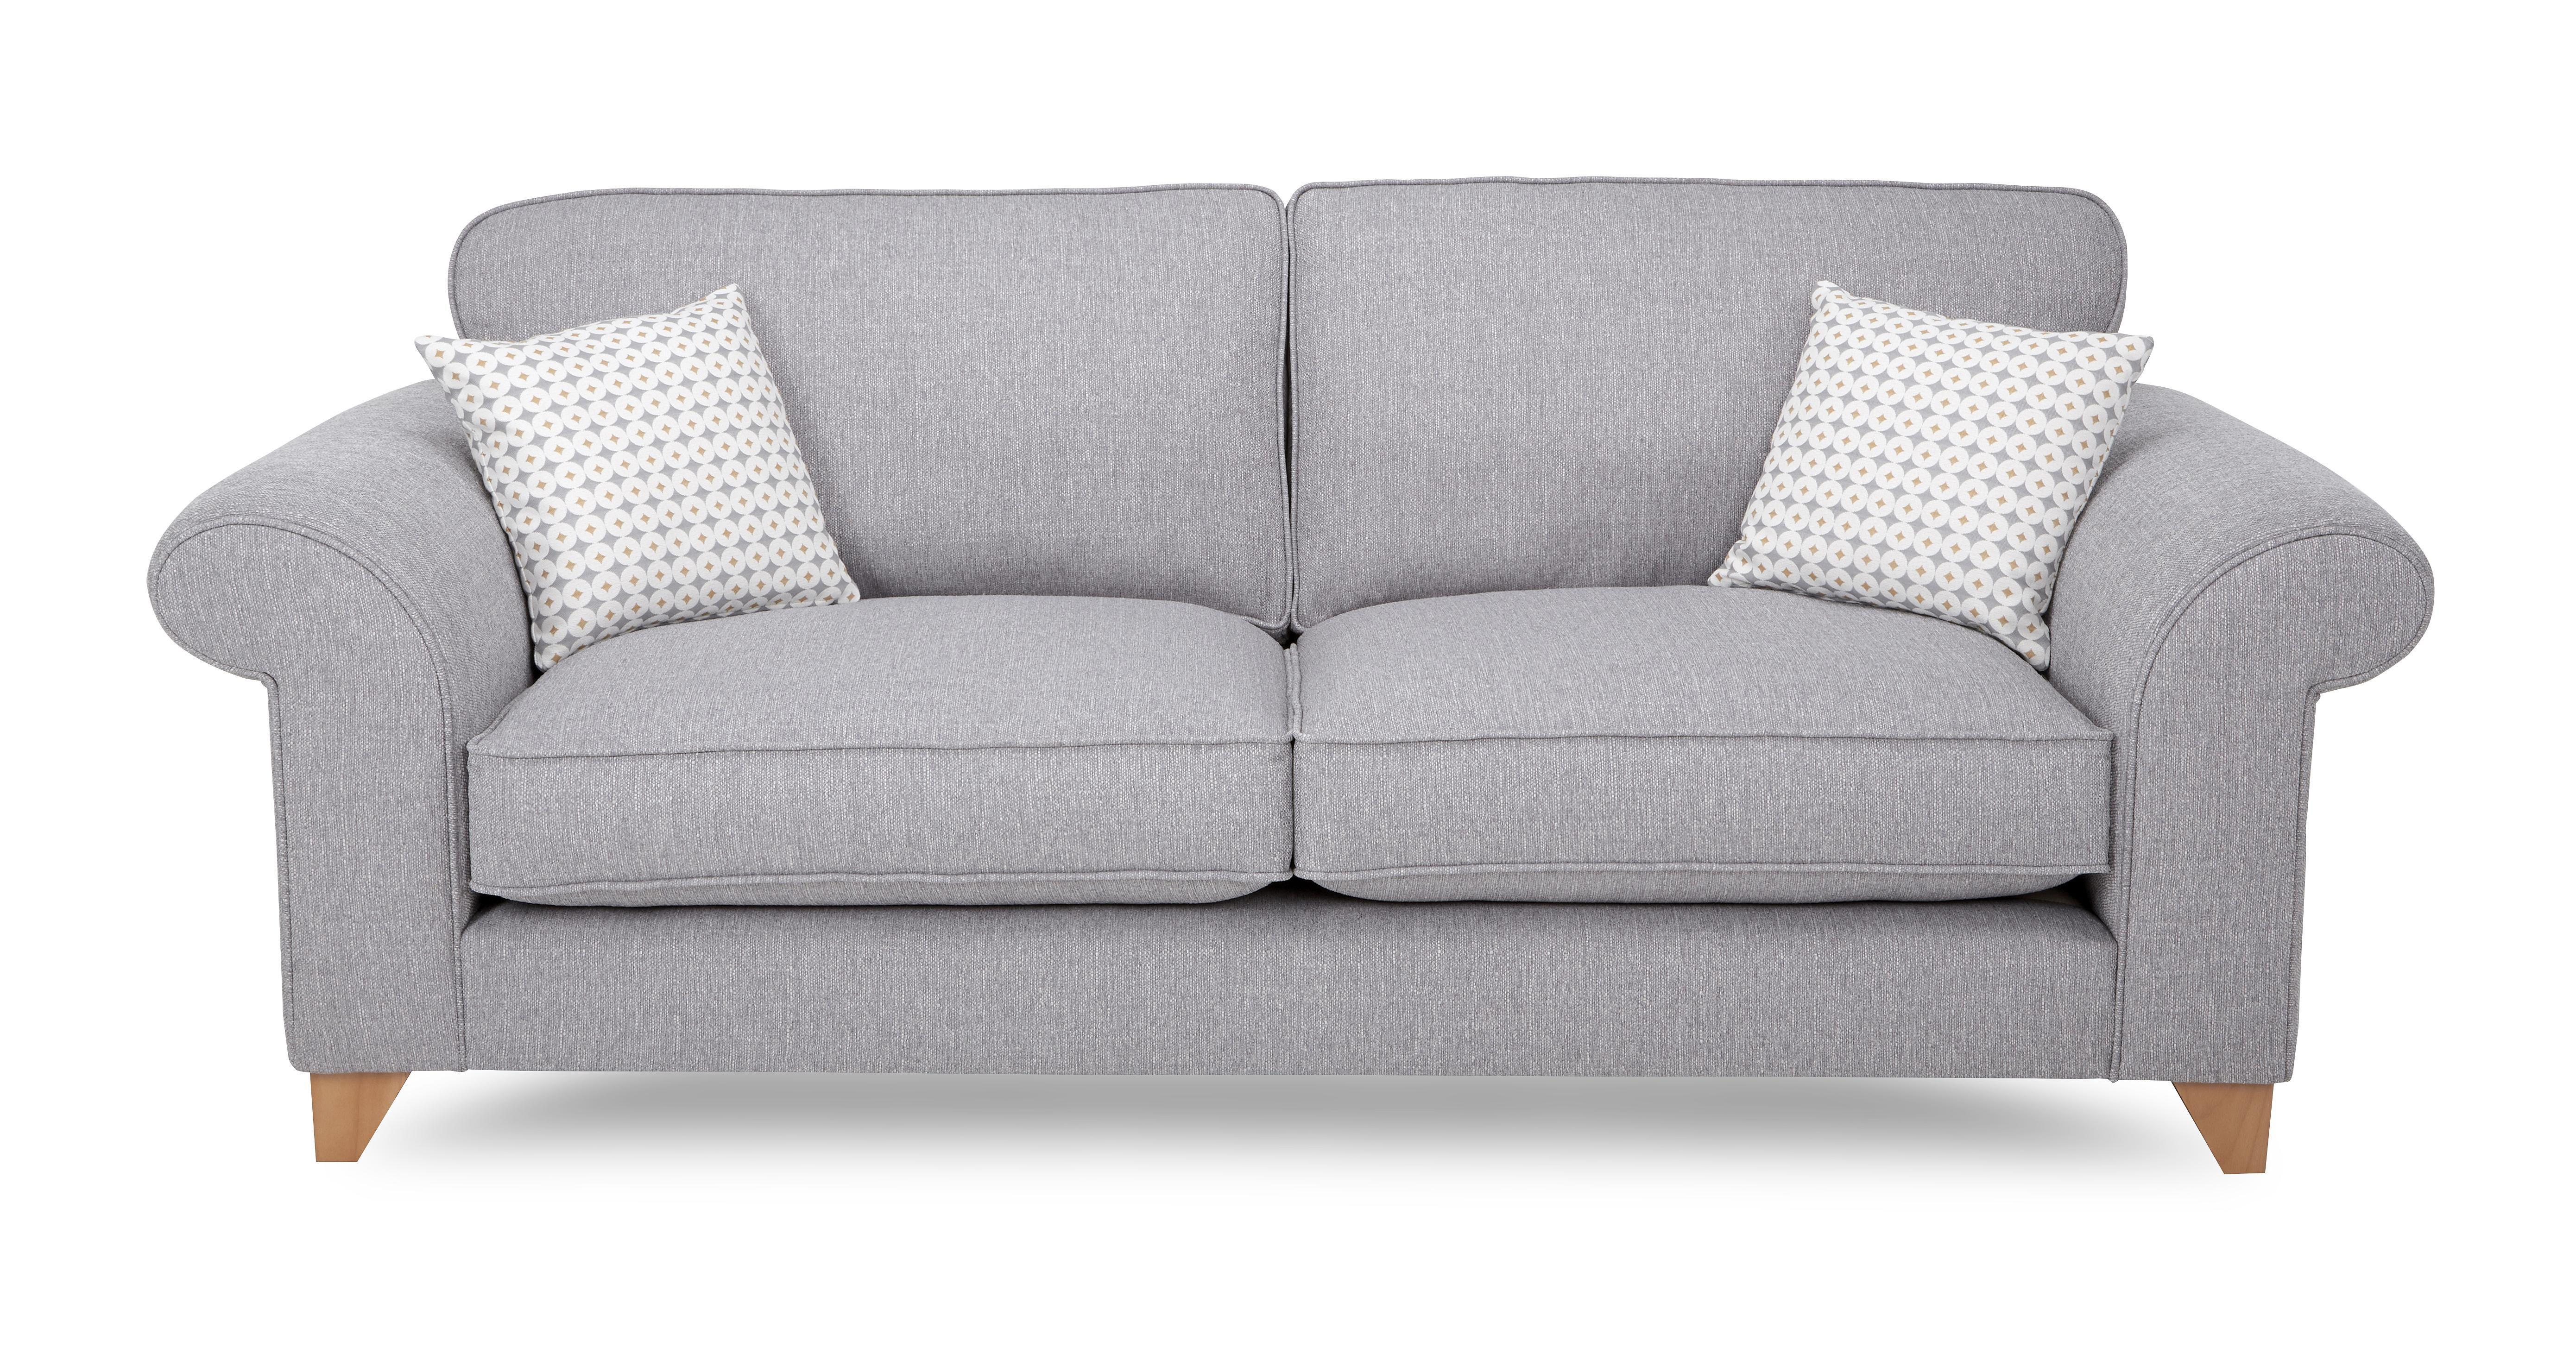 Angelic 3 Seater Sofa Cotswold Plain In 2020 3 Seater Sofa 3 Seater Sofa Bed Fabric Sofa